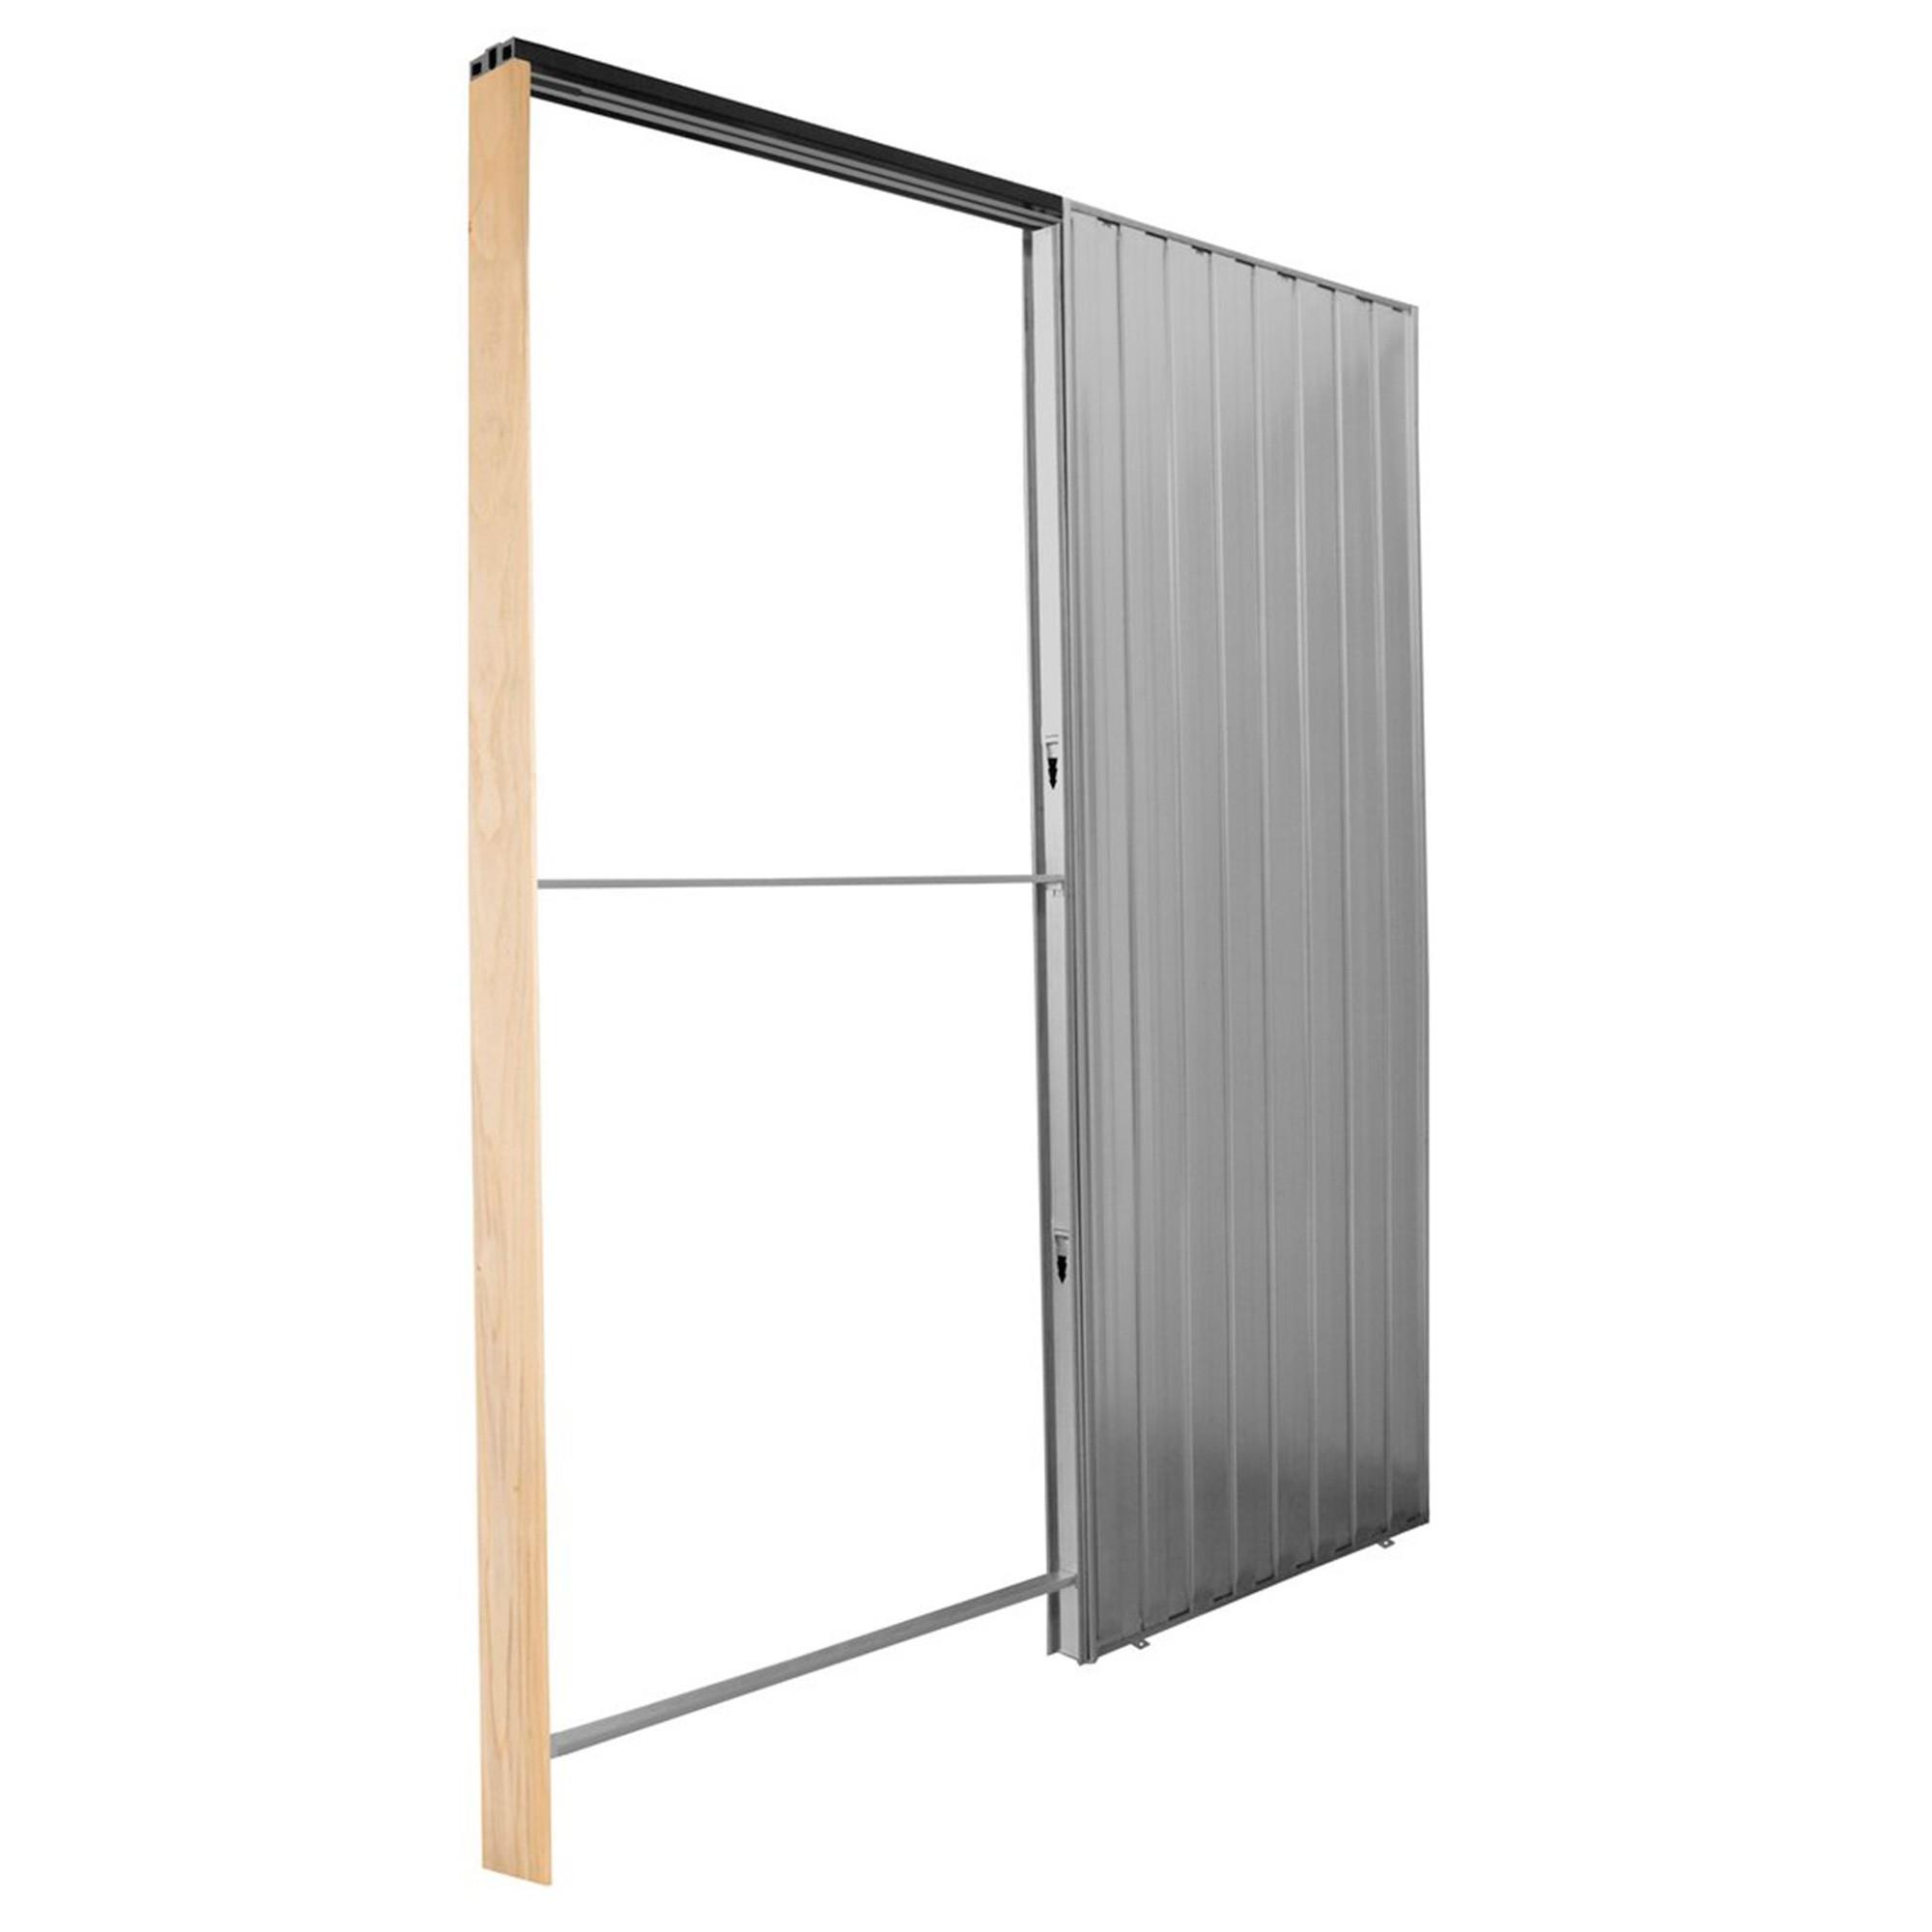 Casoneto puerta corredera pladur finest tarifa casoneto - Puerta corredera doble ...